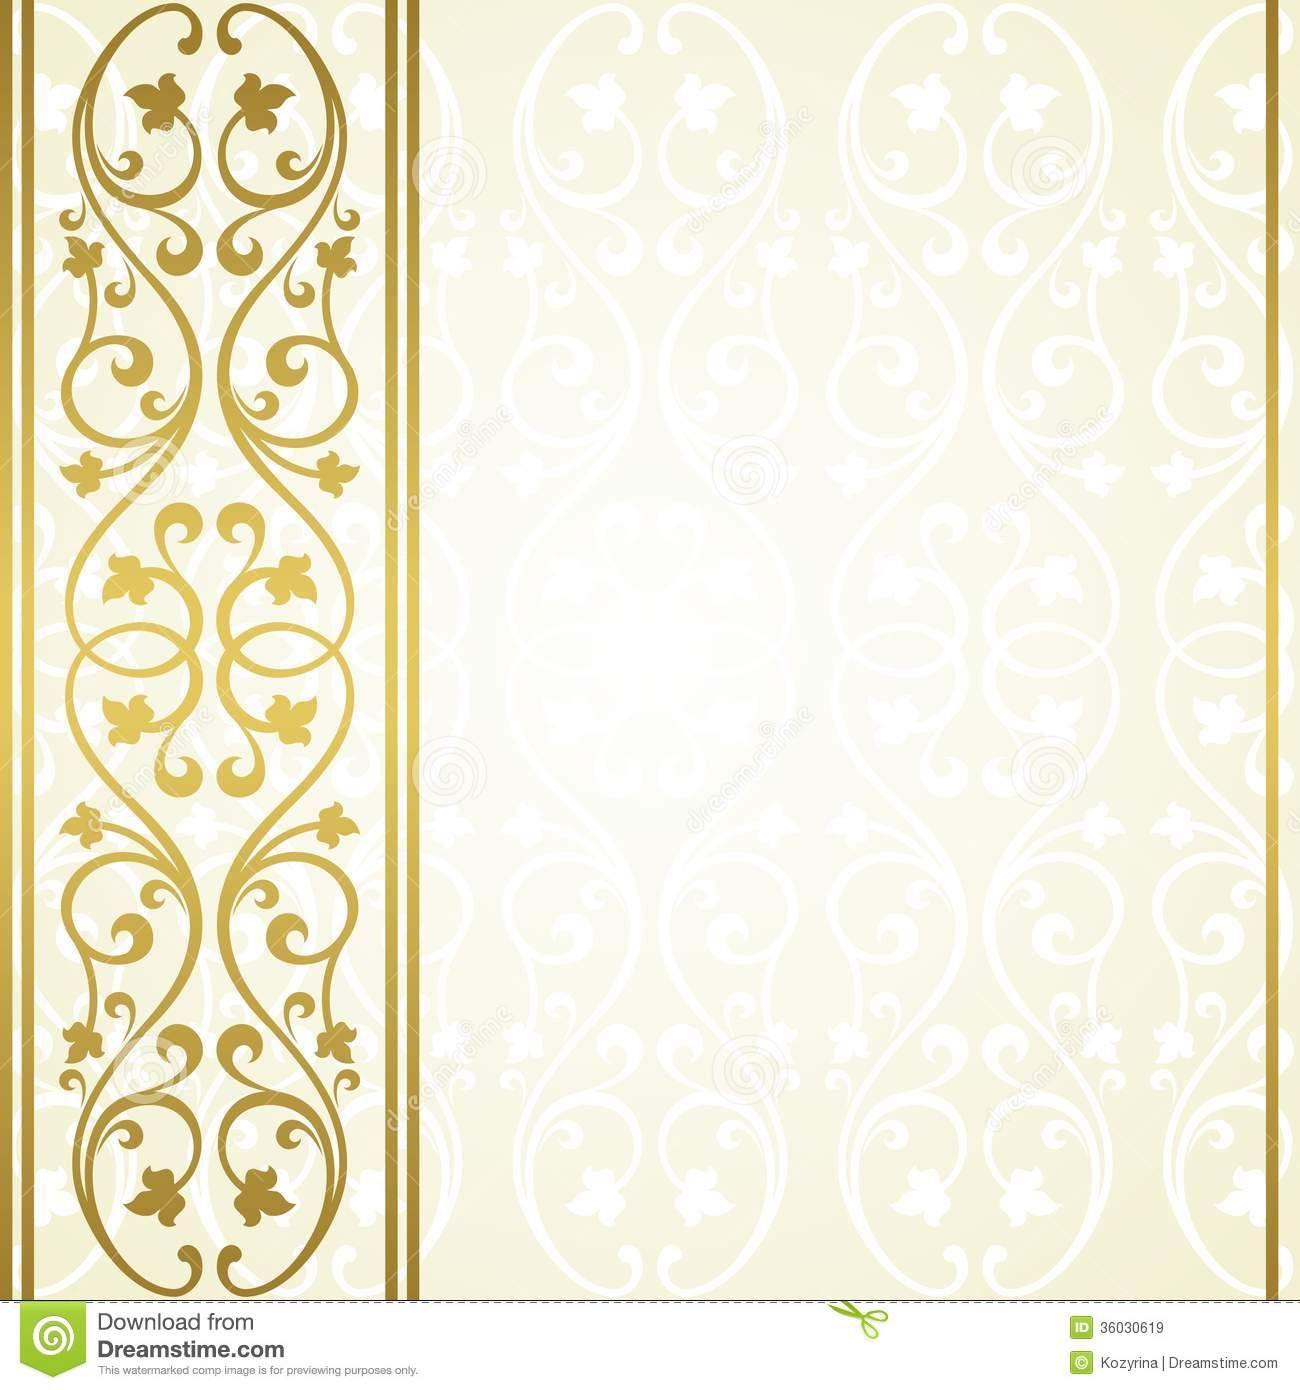 Invitation Card Format Download  Wedding invitation card design